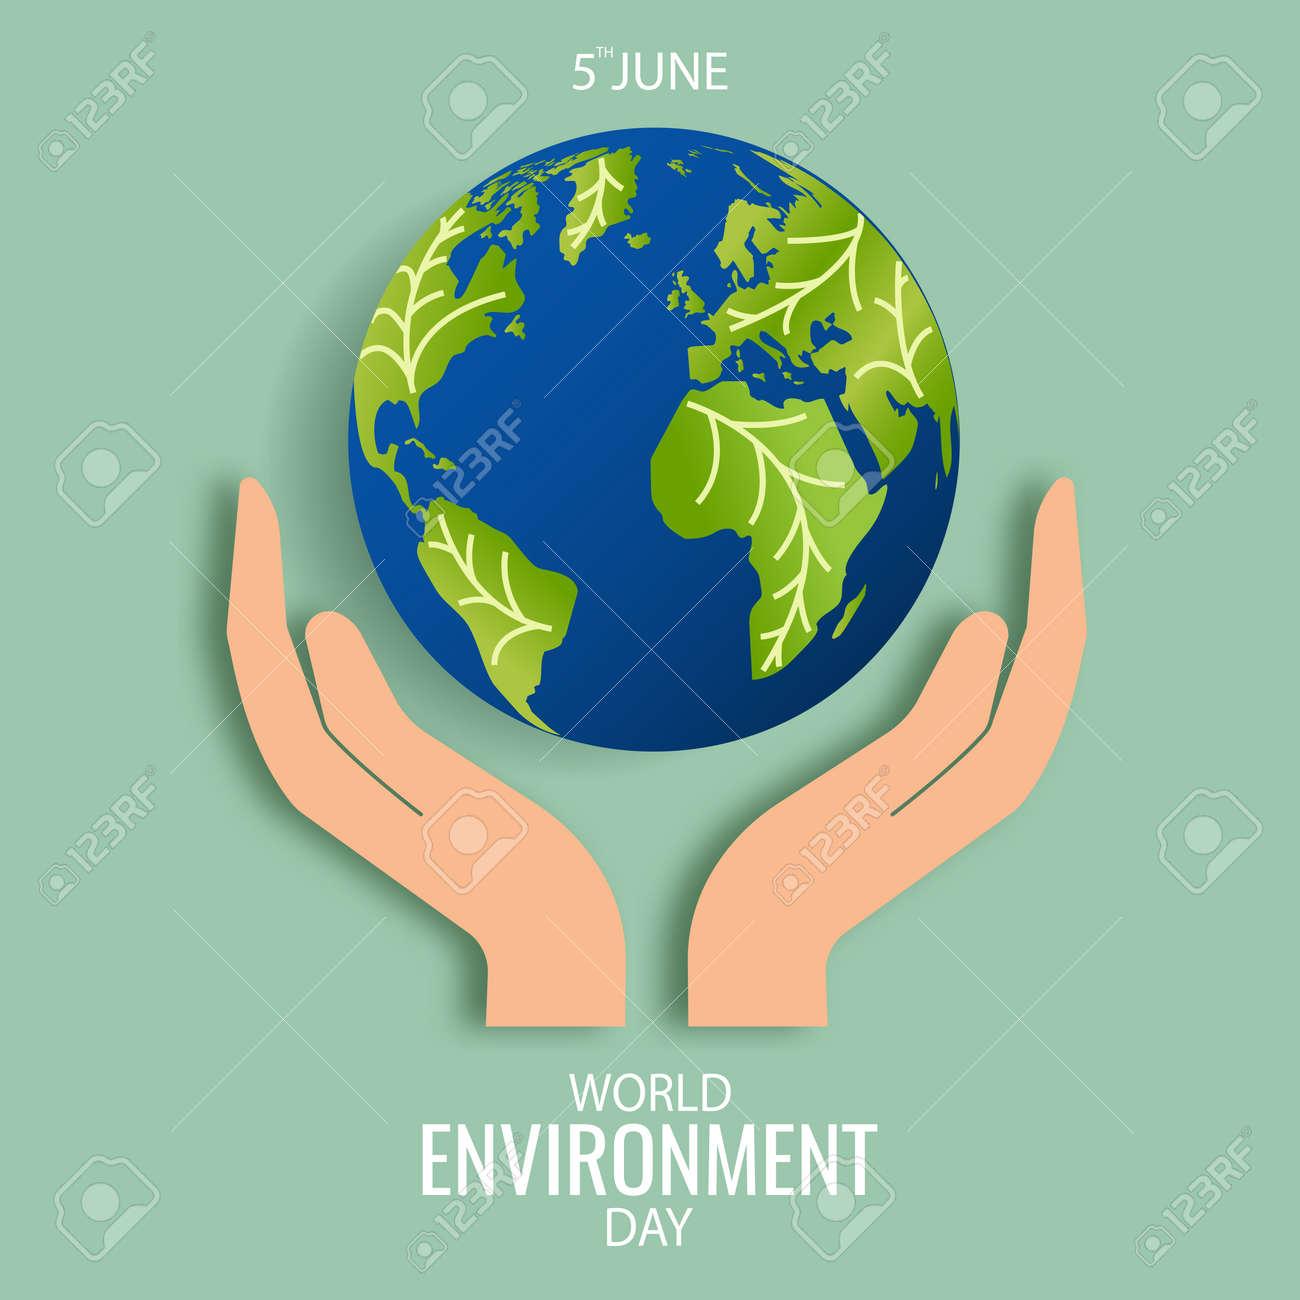 Vector Illustration of World Environment Day. - 168191068